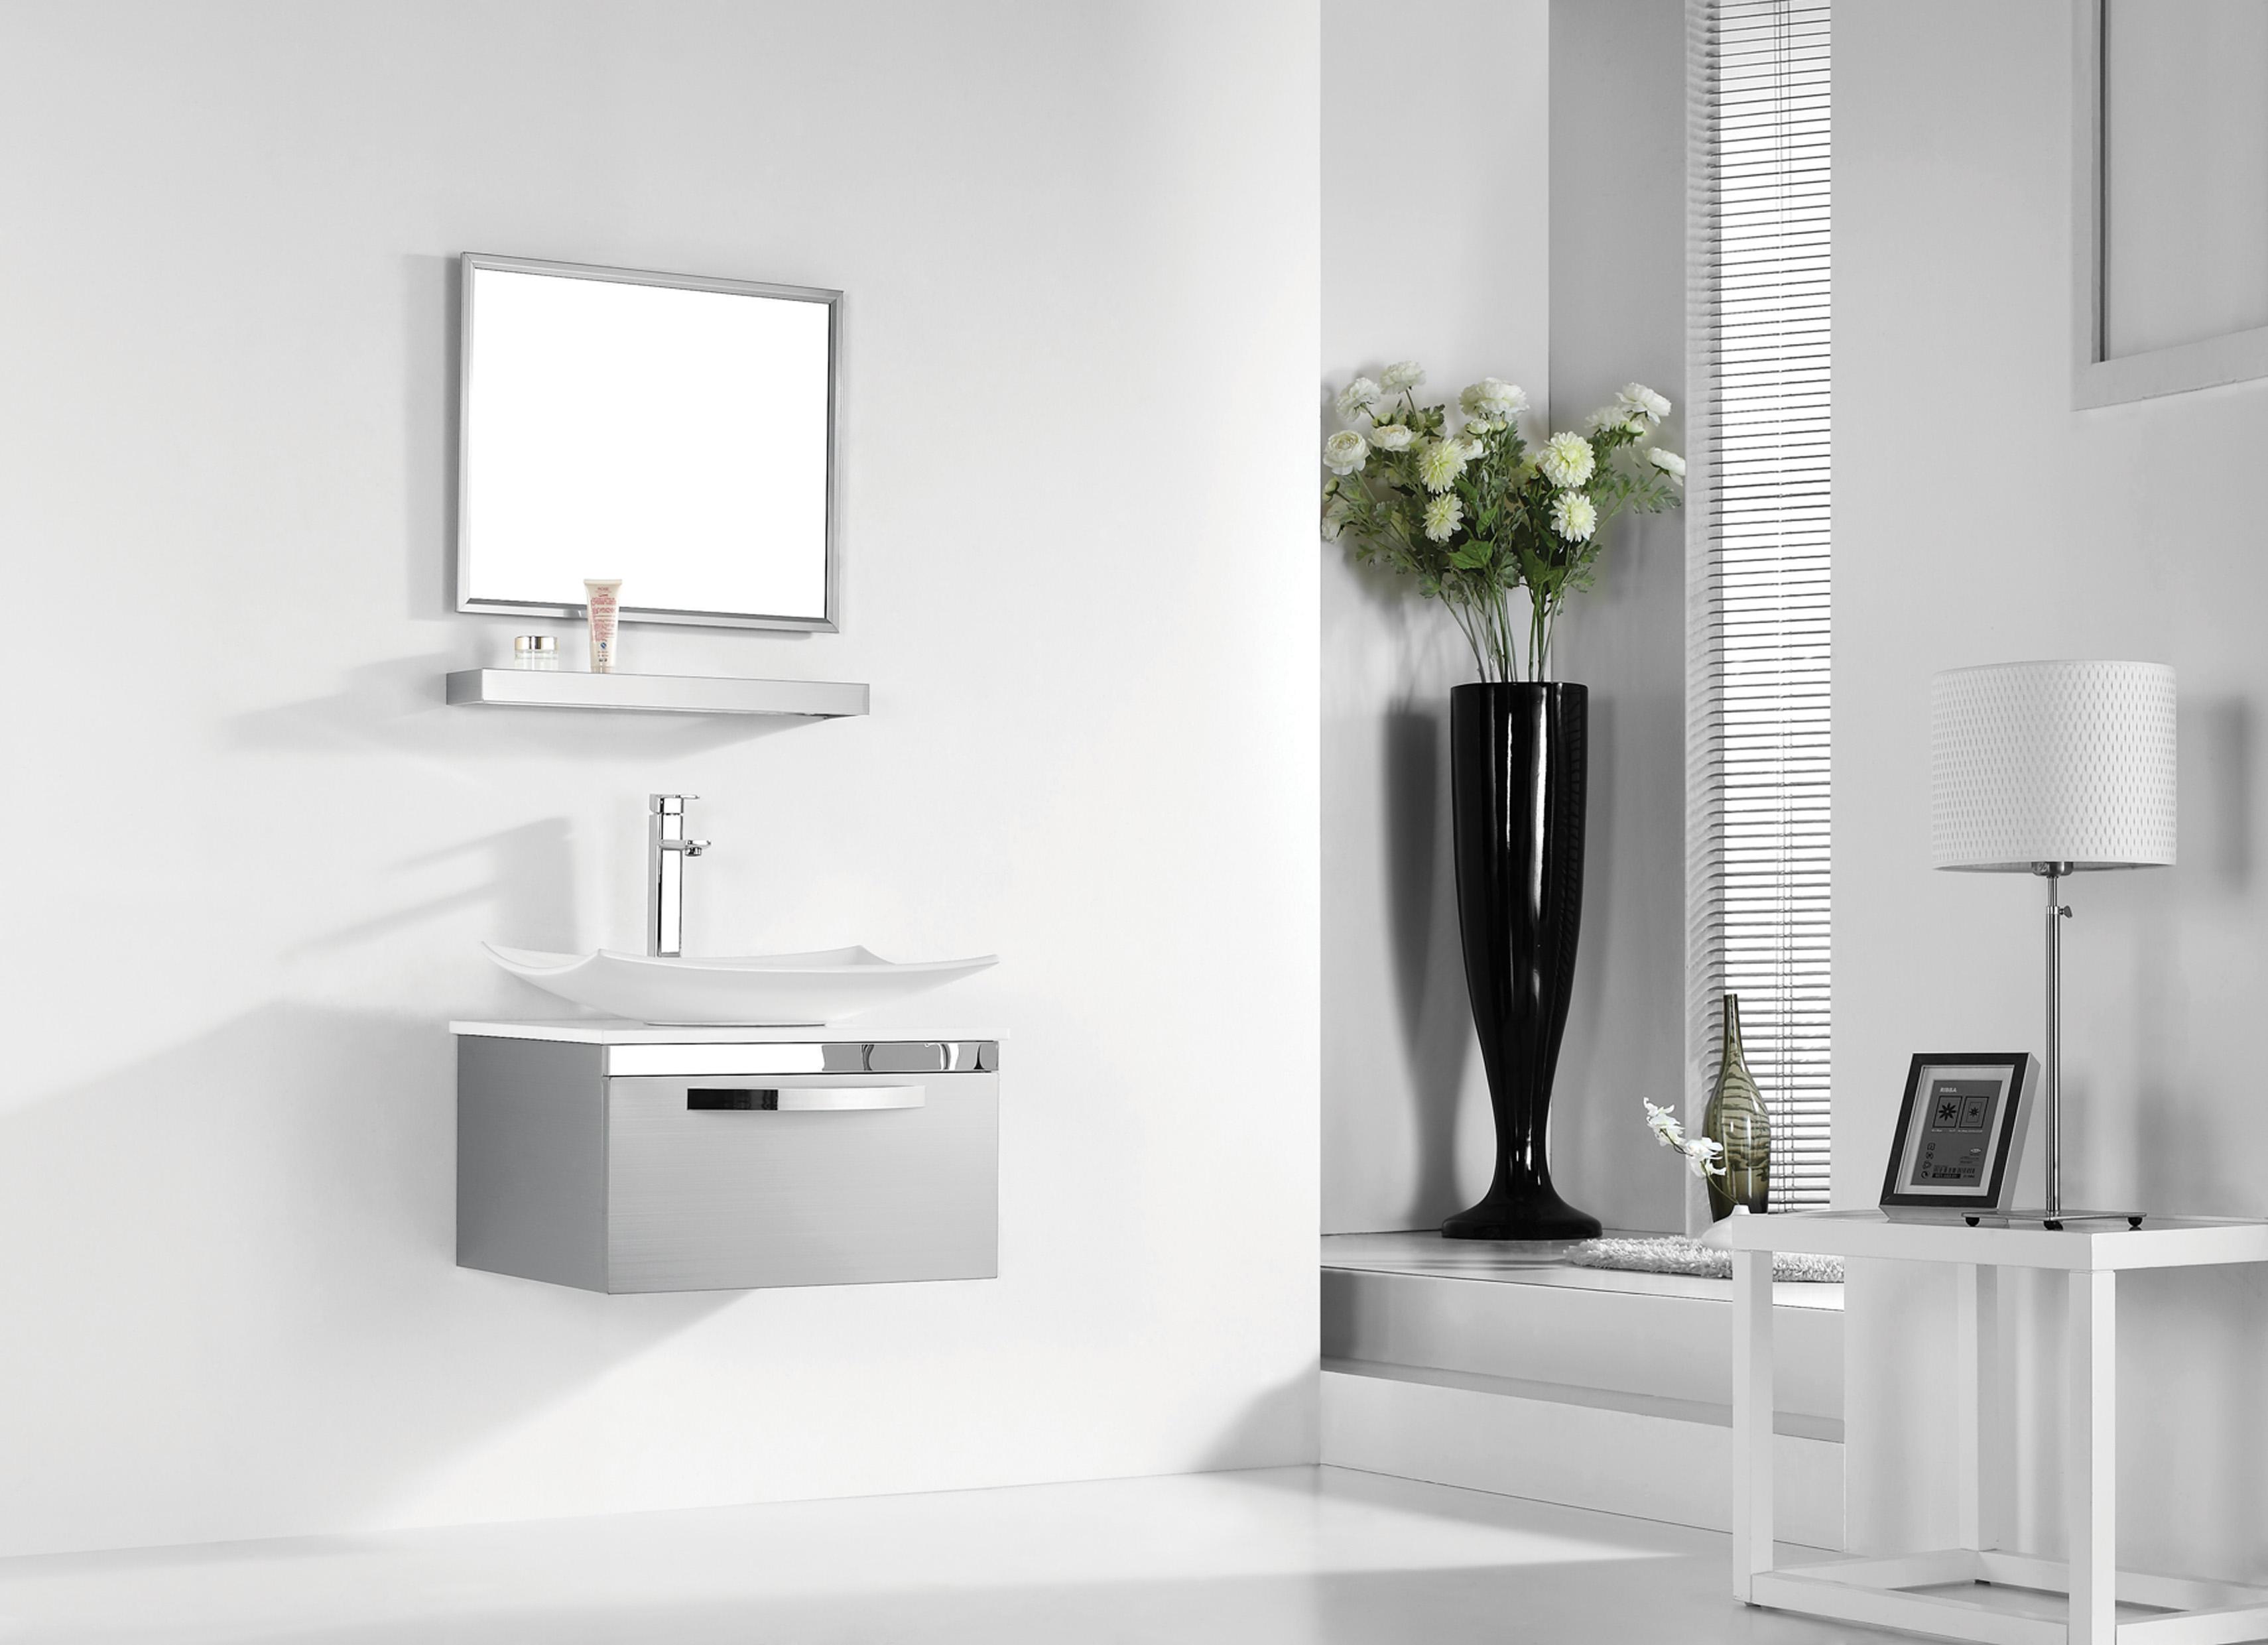 badmöbel gäste wc | huboonline, Hause ideen